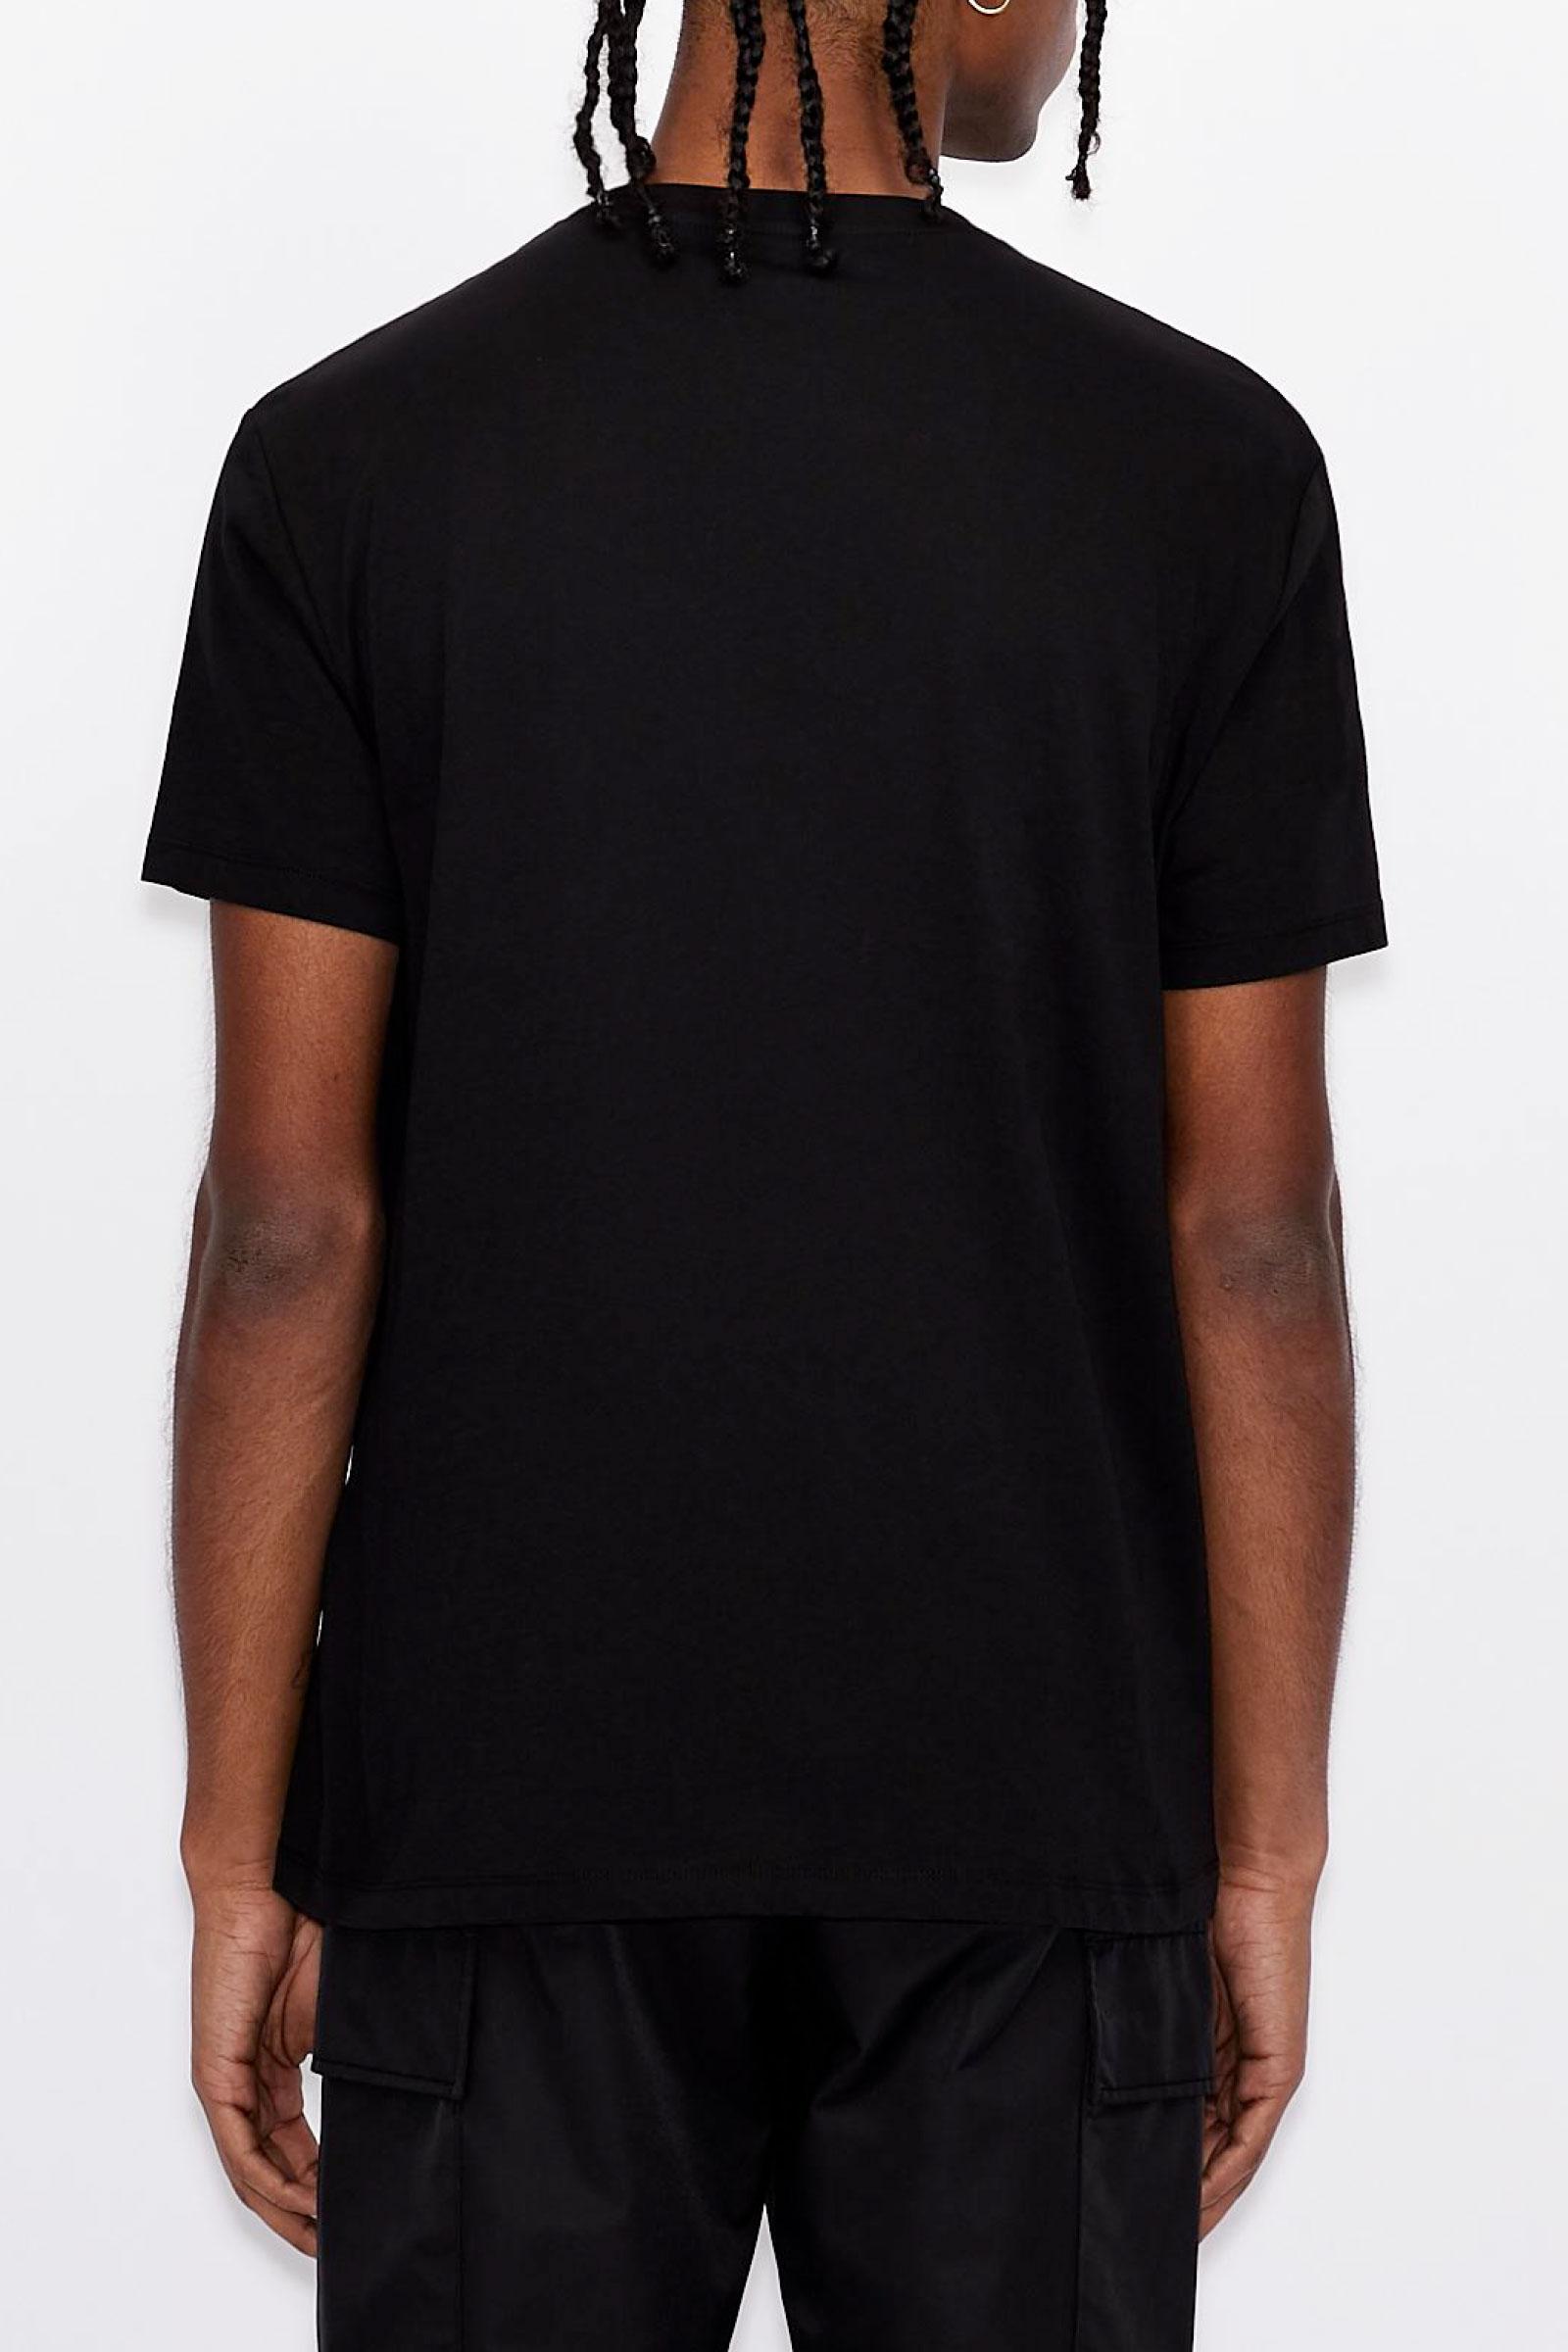 ARMANI EXCHANGE T-Shirt Uomo ARMANI EXCHANGE | T-Shirt | 3KZTAF ZJ4JZ1200